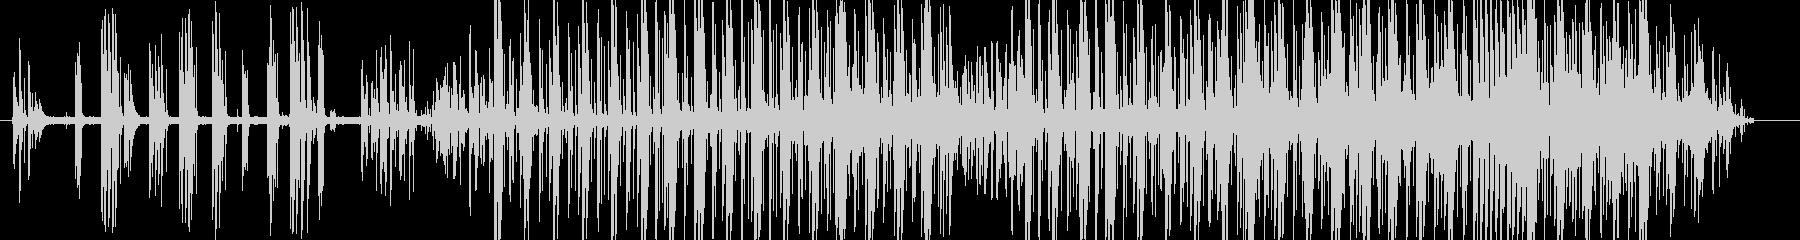 kaf の未再生の波形